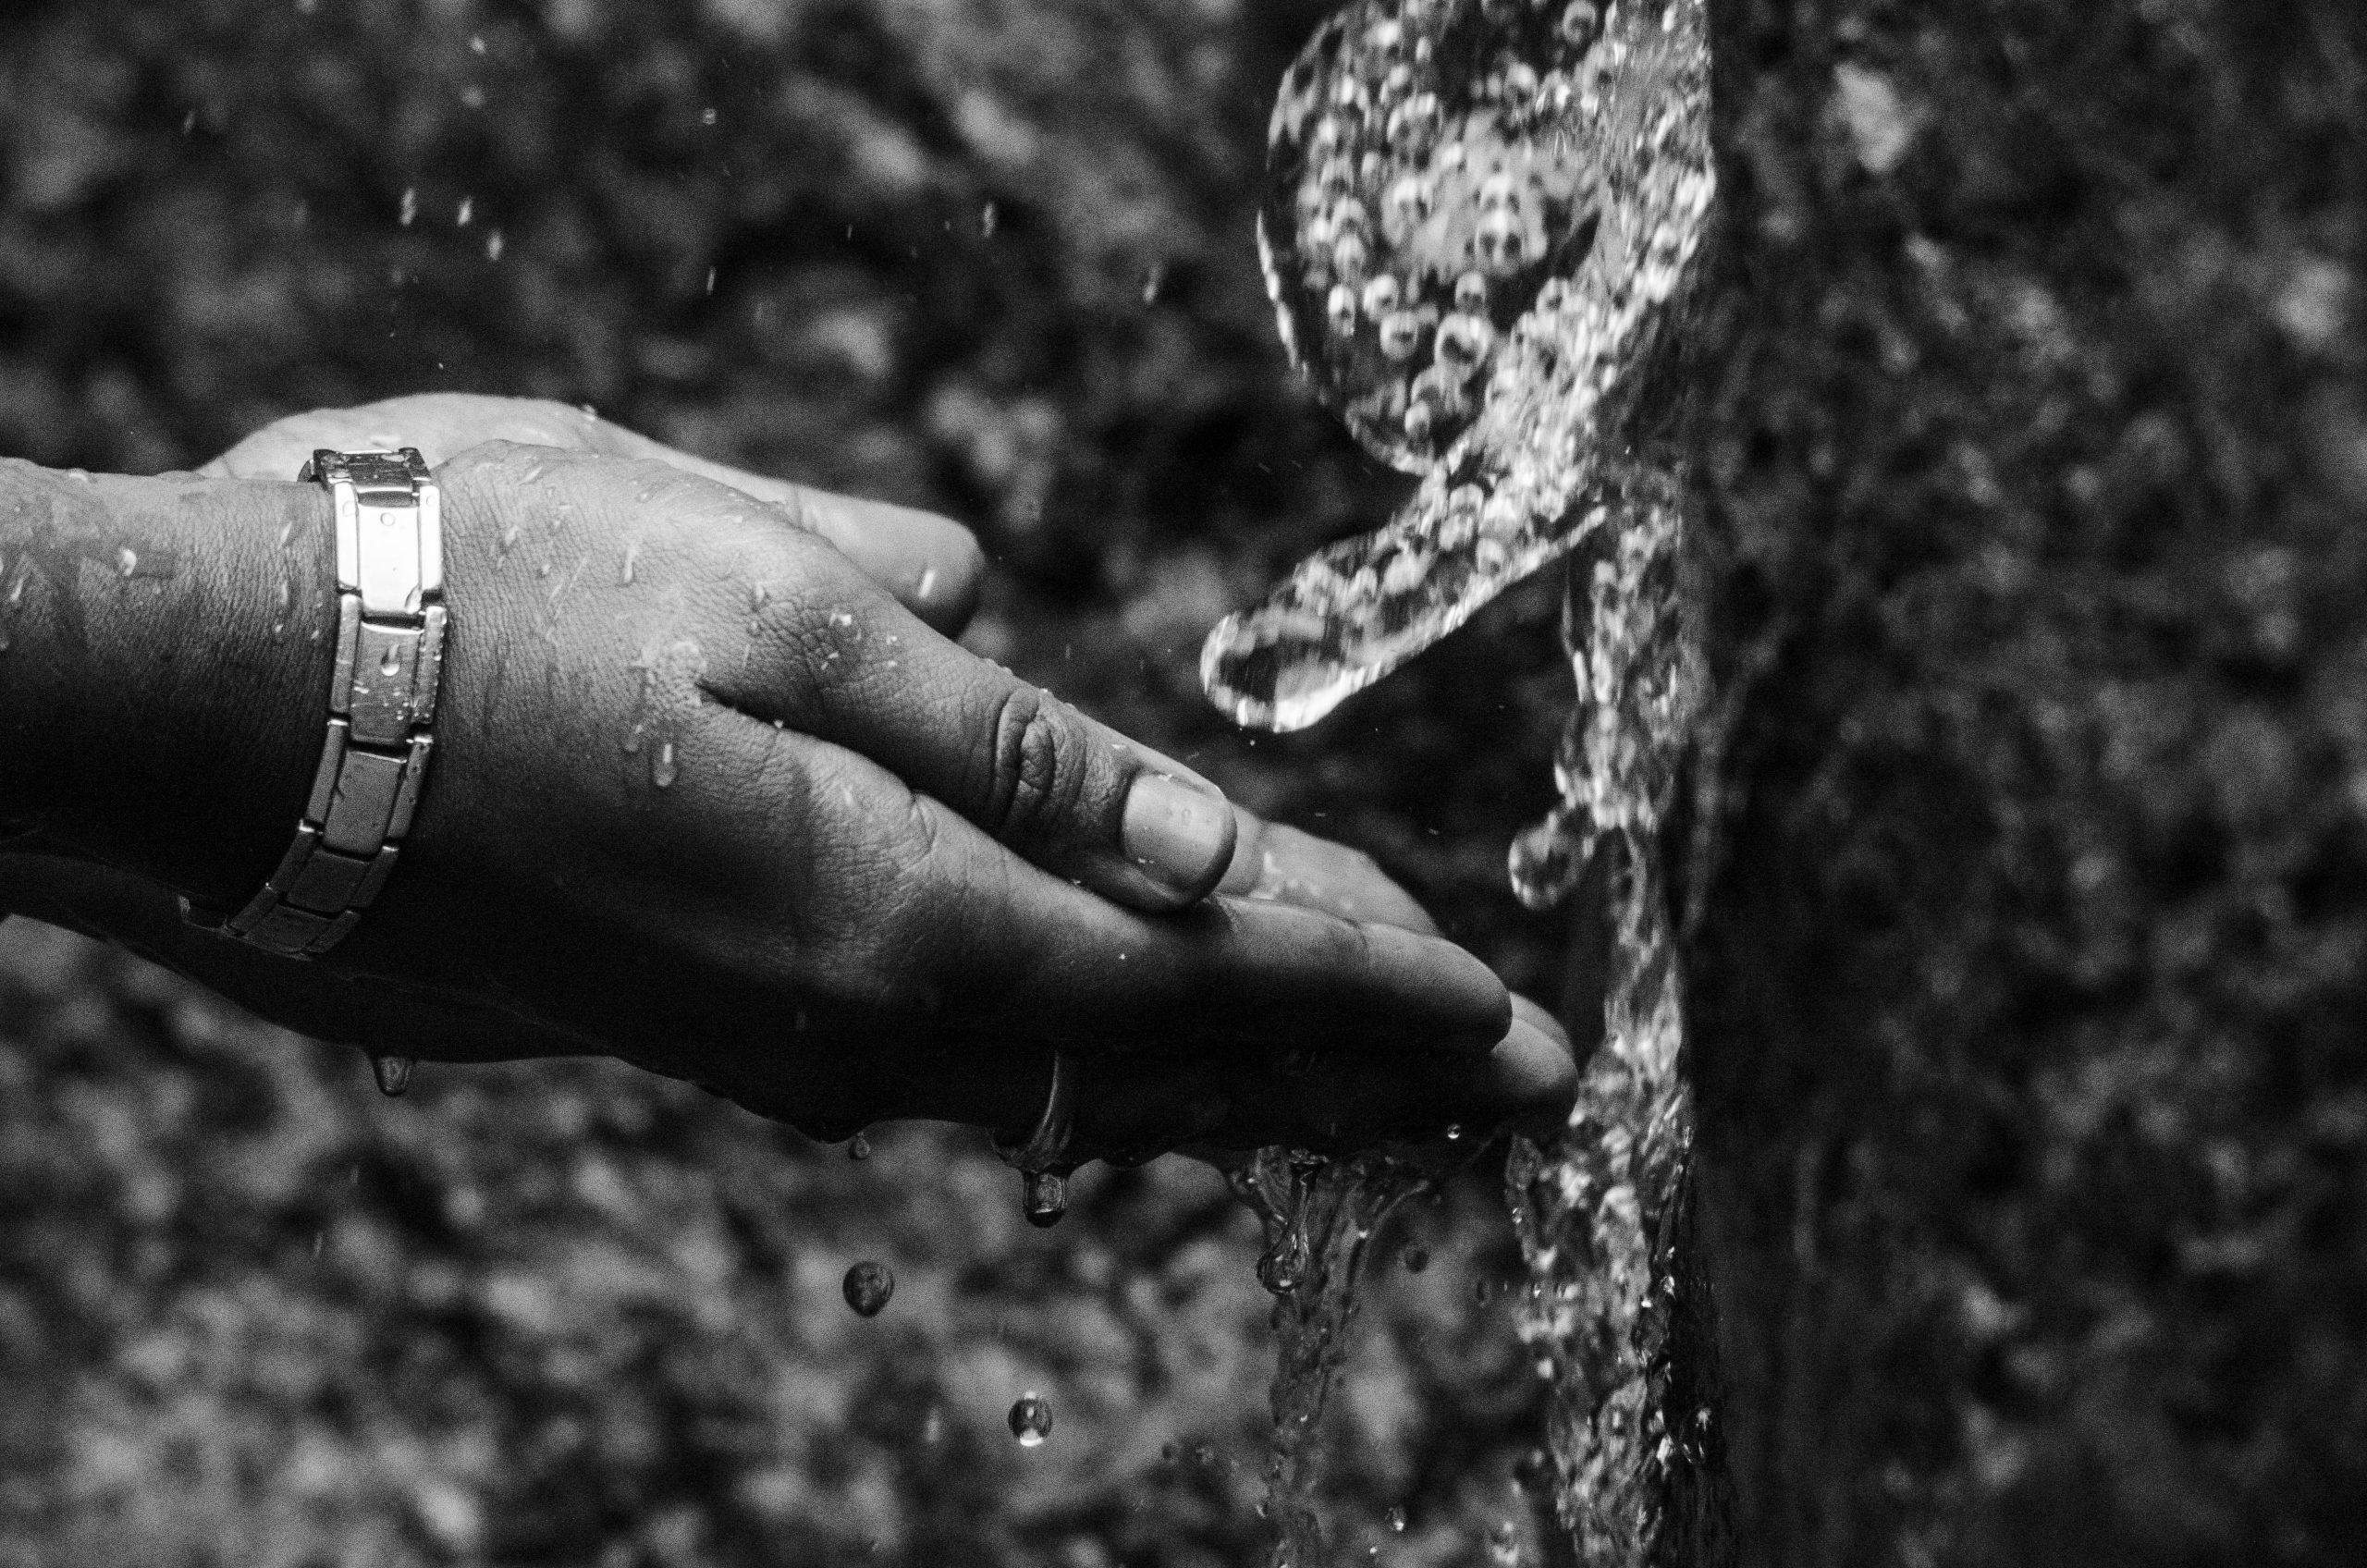 Hands toward a waterfall